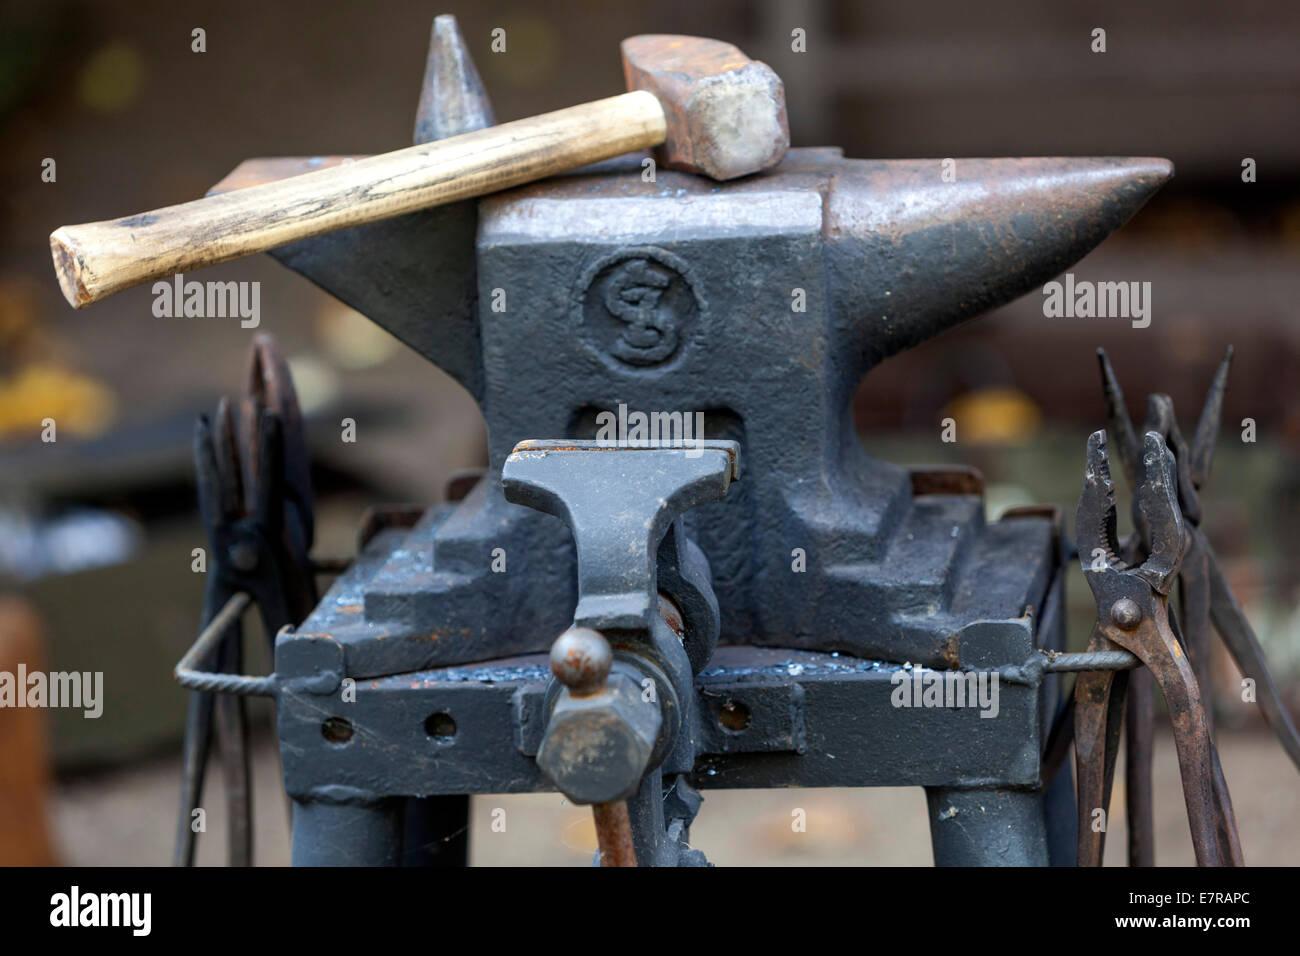 anvil blacksmith tools - Stock Image